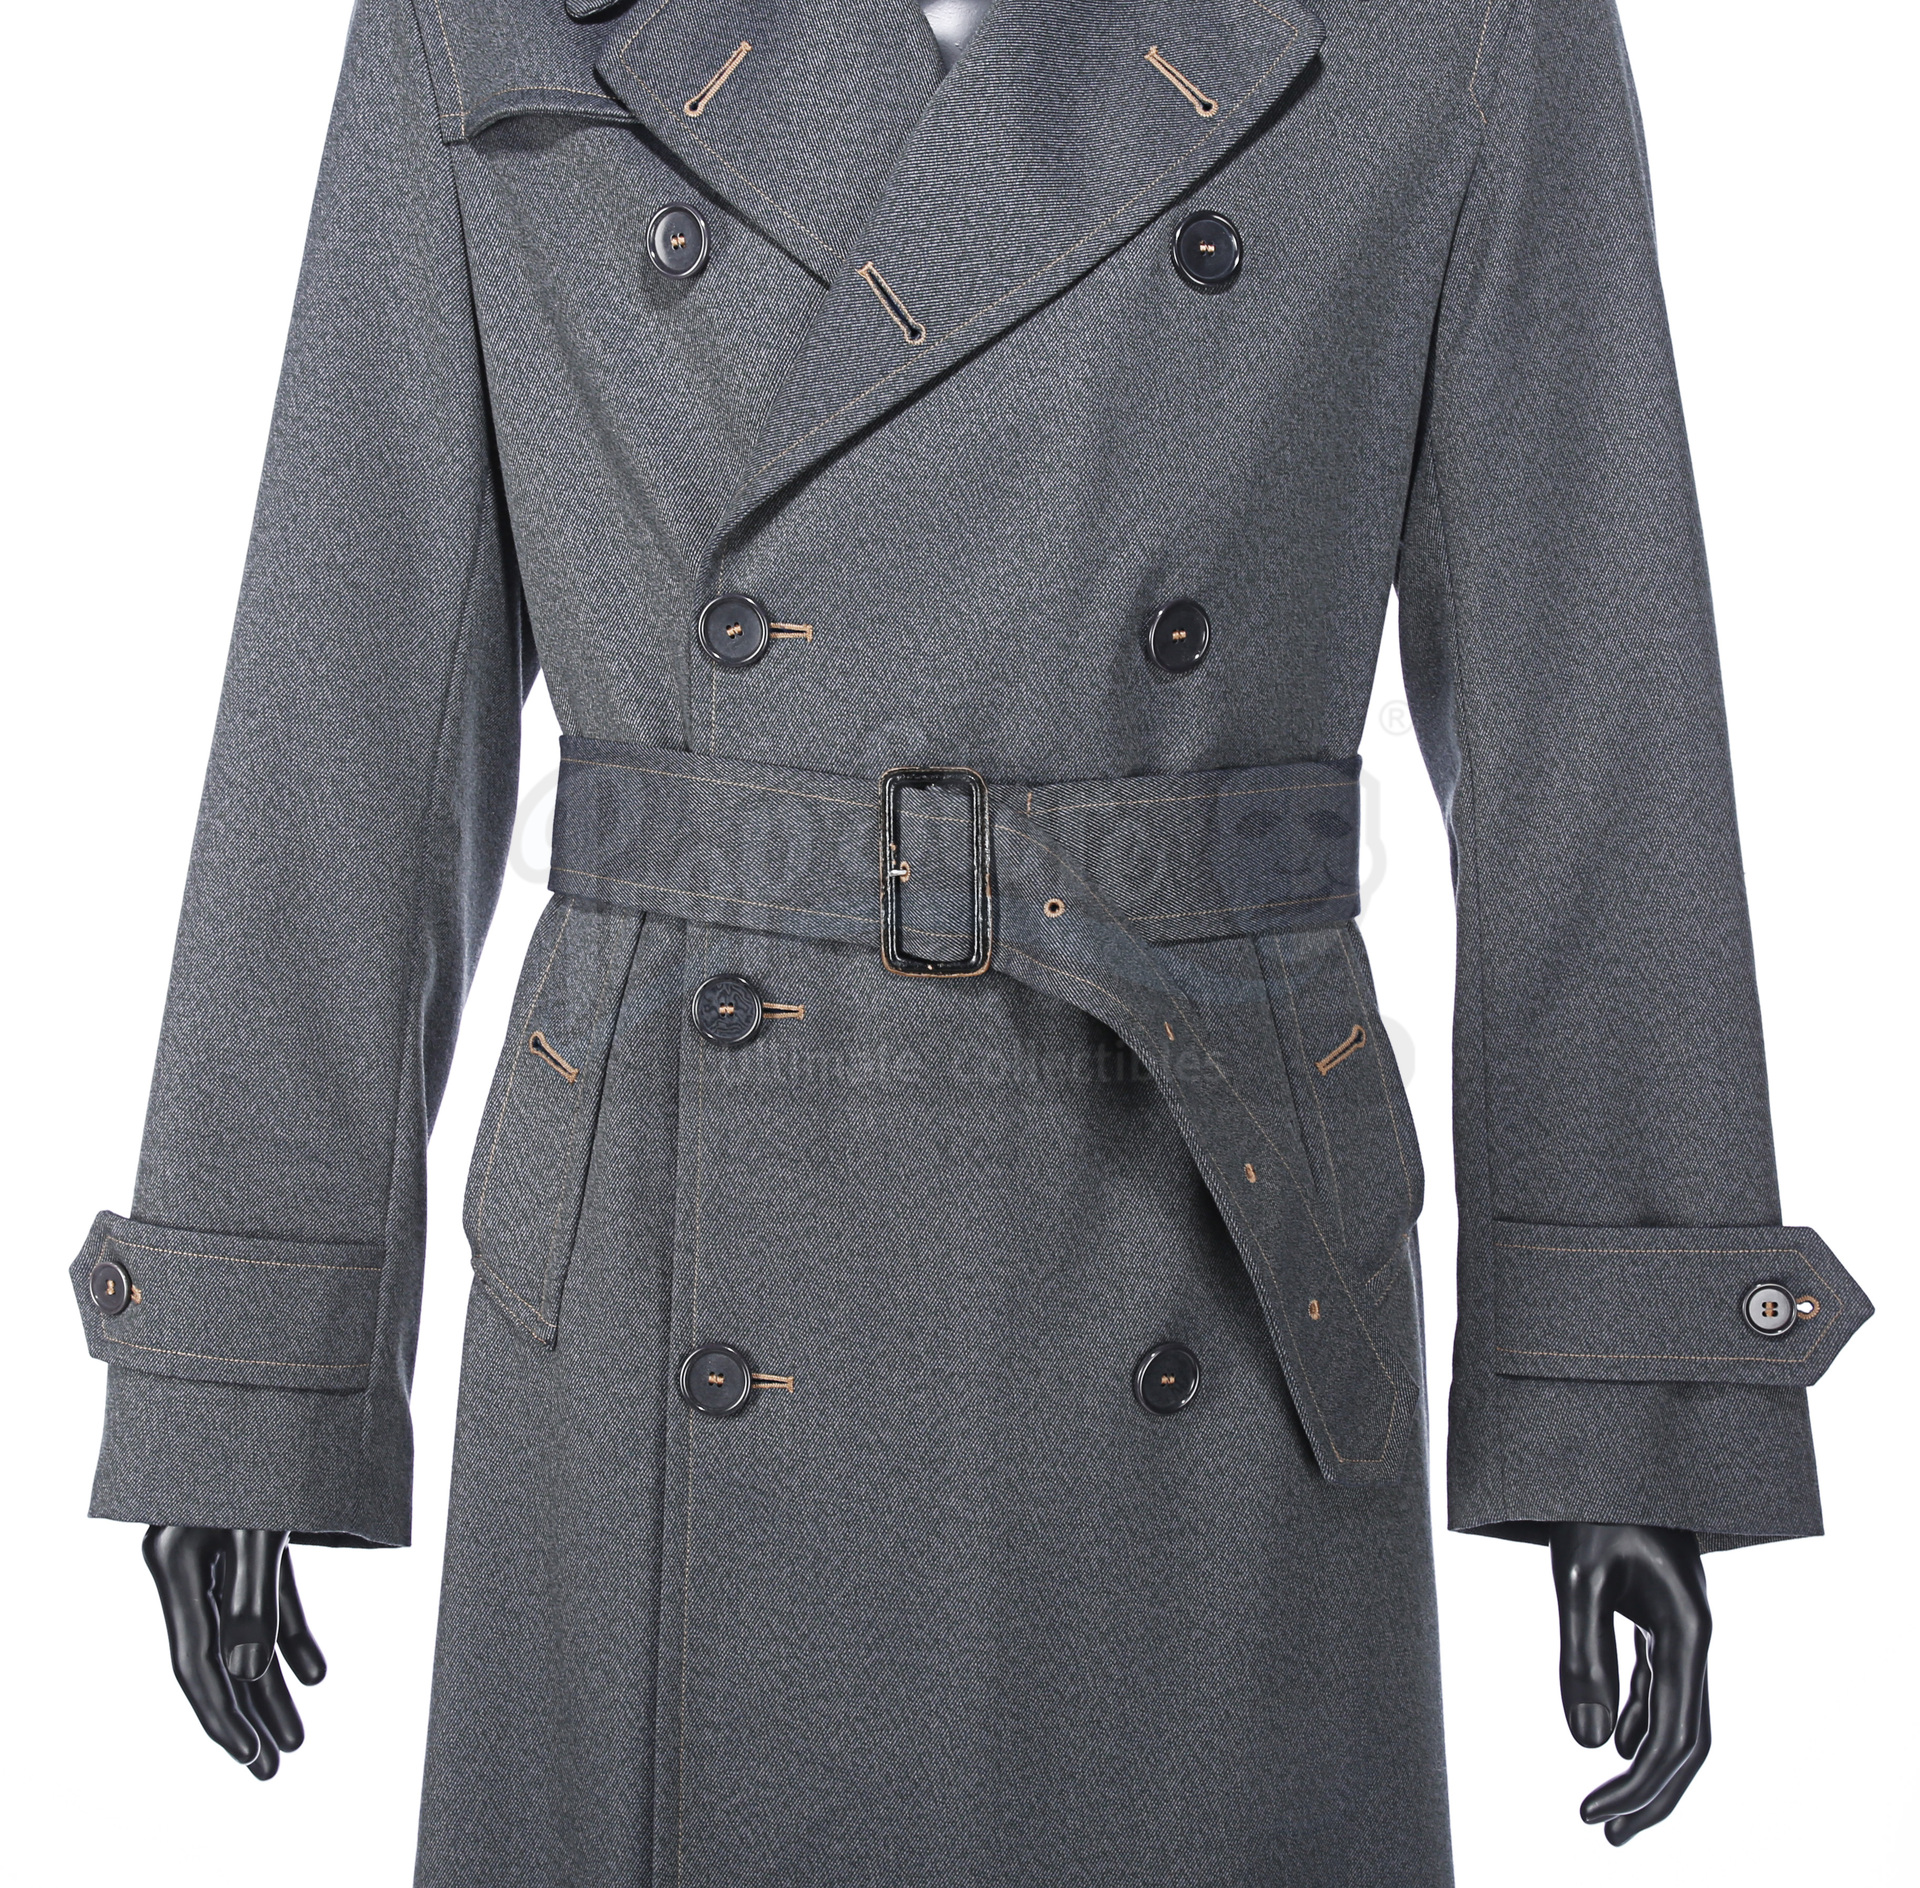 ALLIED (2016) - Max's (Brad Pitt) Military Overcoat - Image 5 of 17